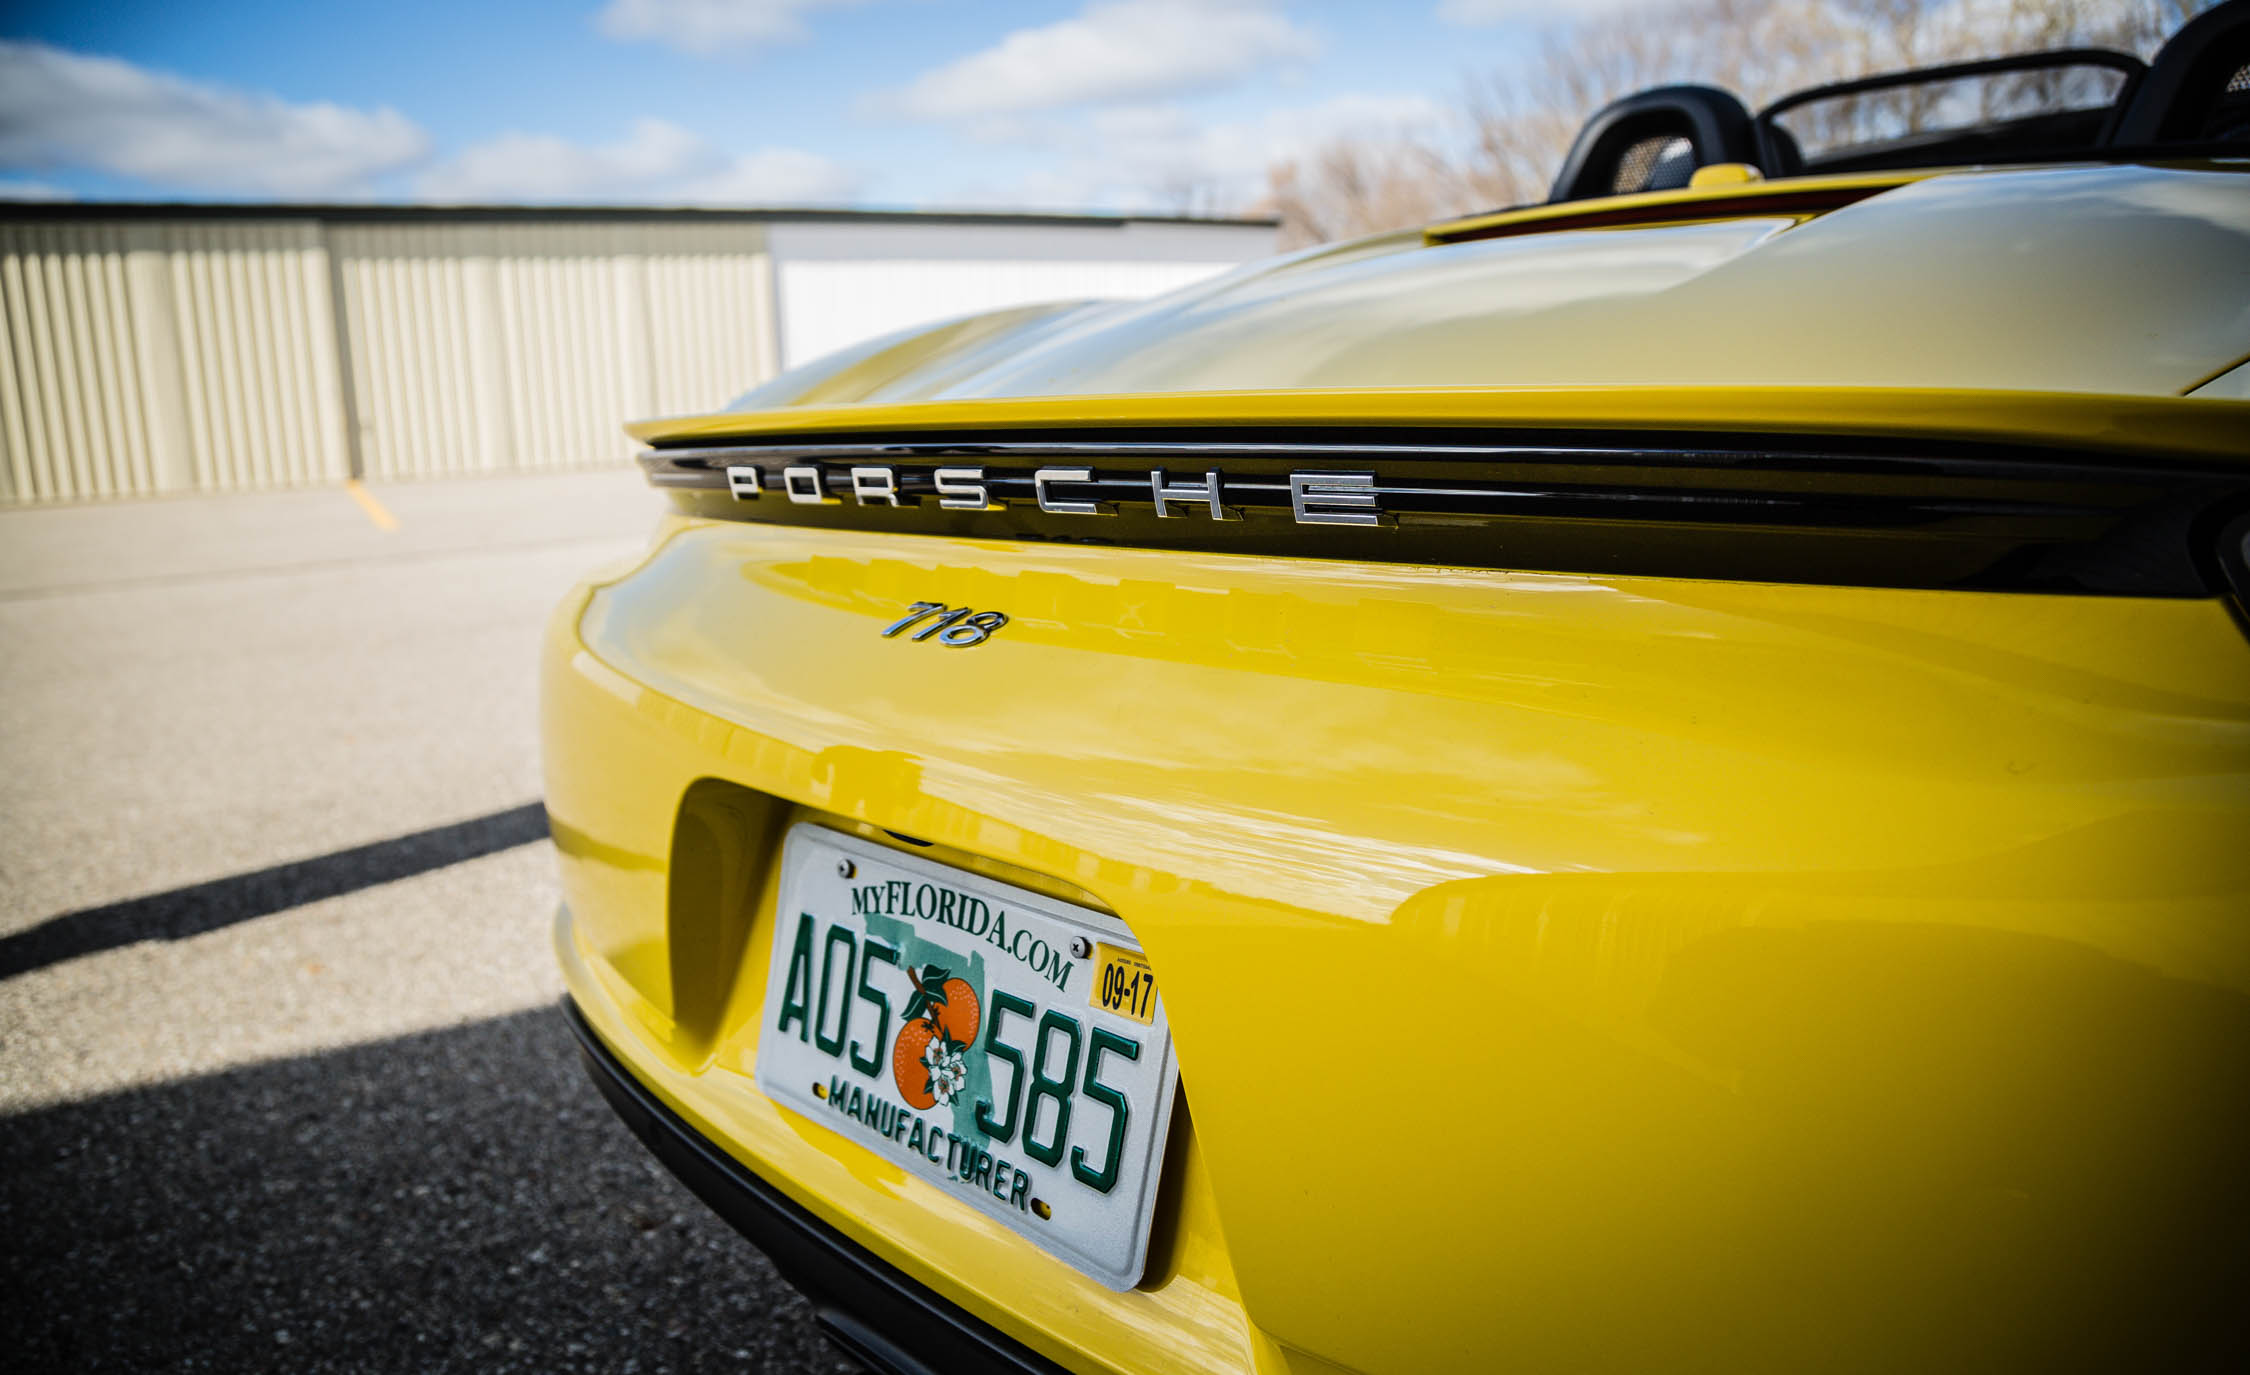 2017 Porsche 718 Boxster Exterior View Rear Emblem (Photo 37 of 71)